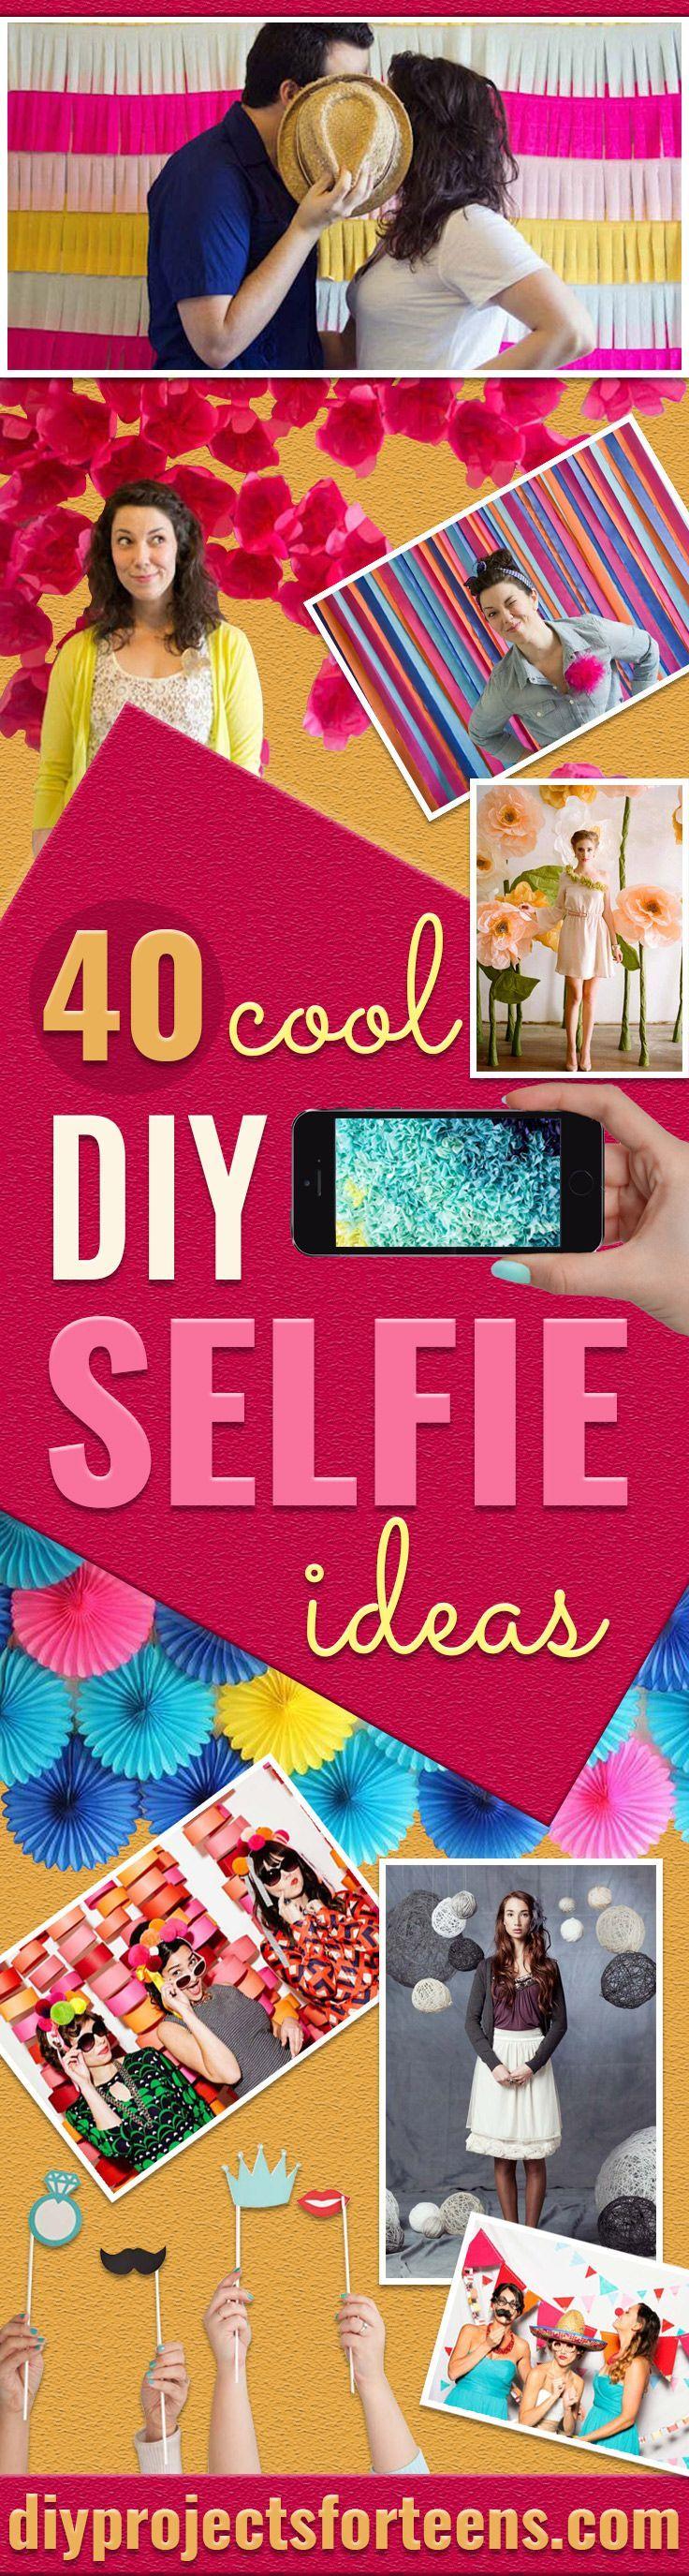 Creative Selfie Wall Of Best 25 Creative Selfie Ideas Ideas On Pinterest